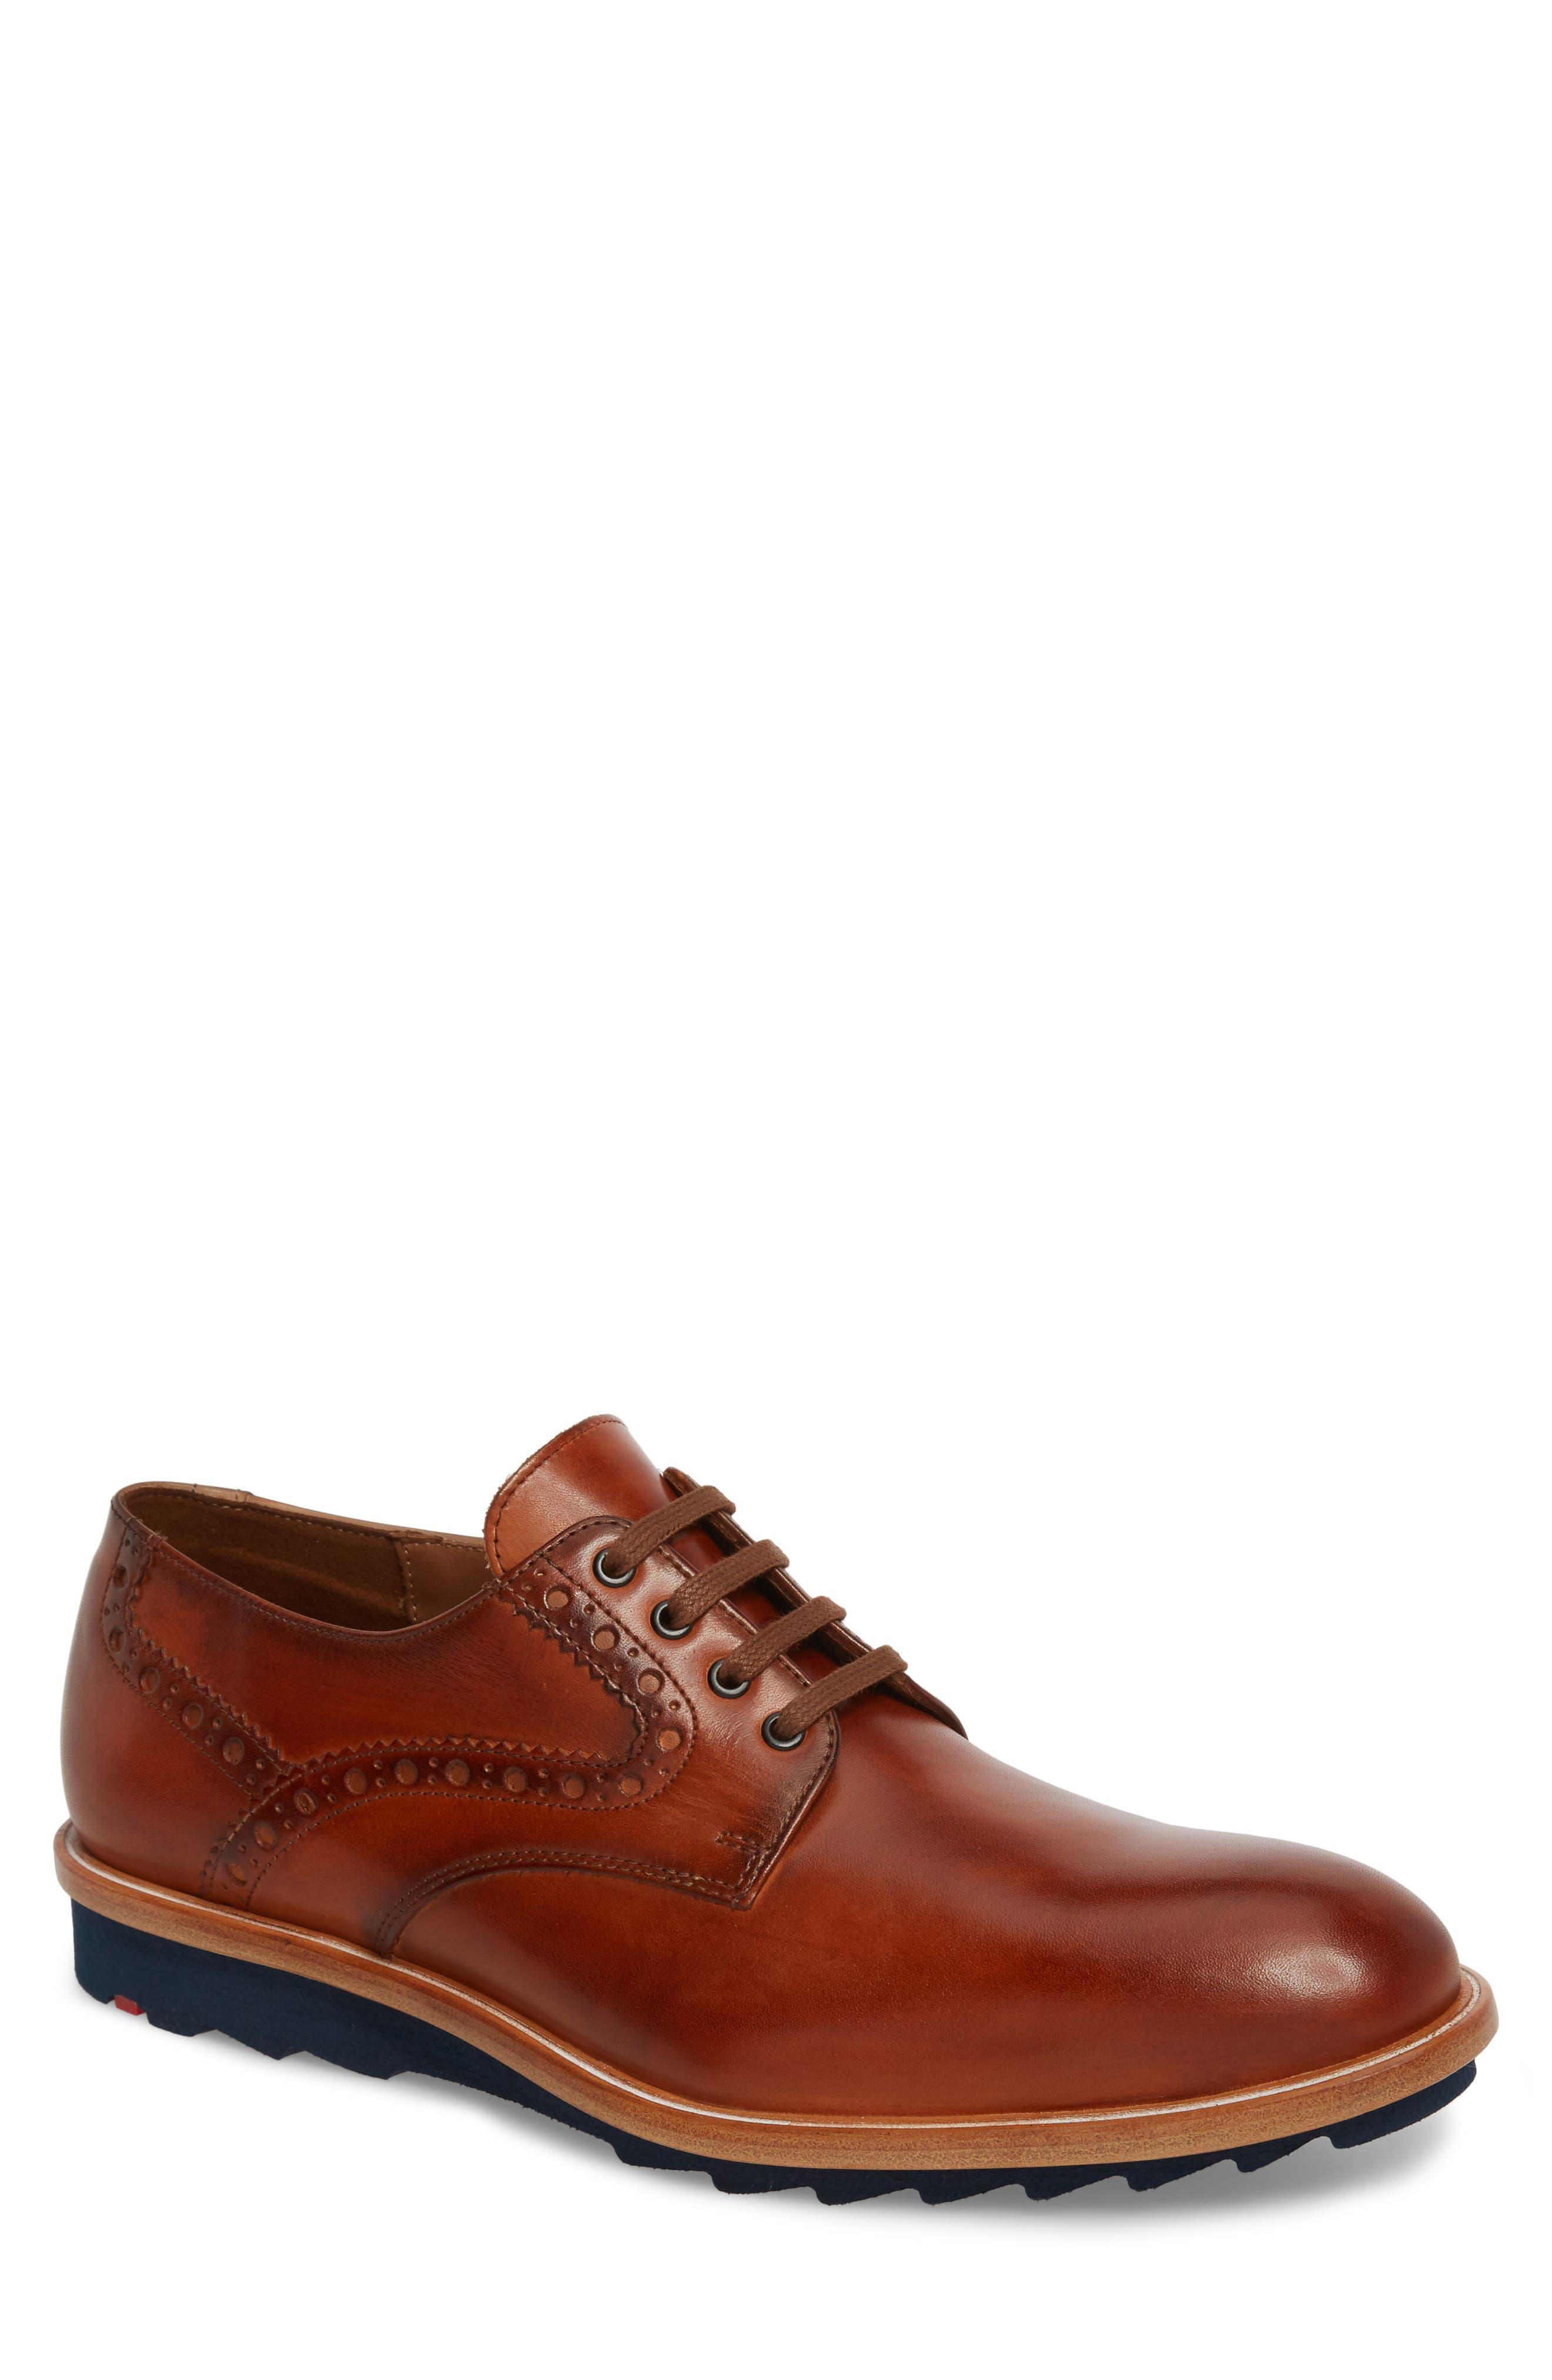 Lloyd Men's Kandy Plain Toe Derby jOO8L